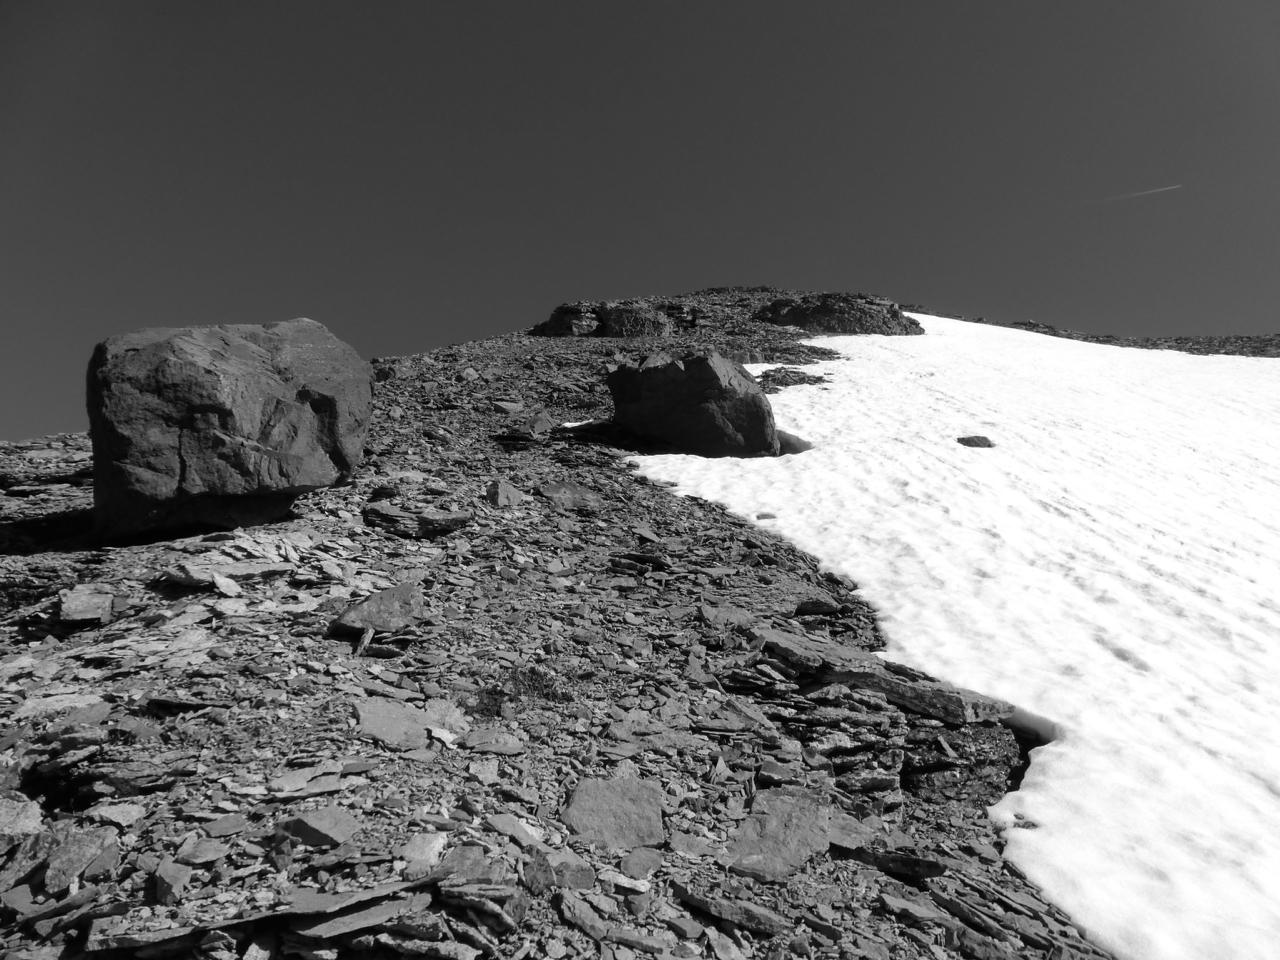 Cirque near false summit